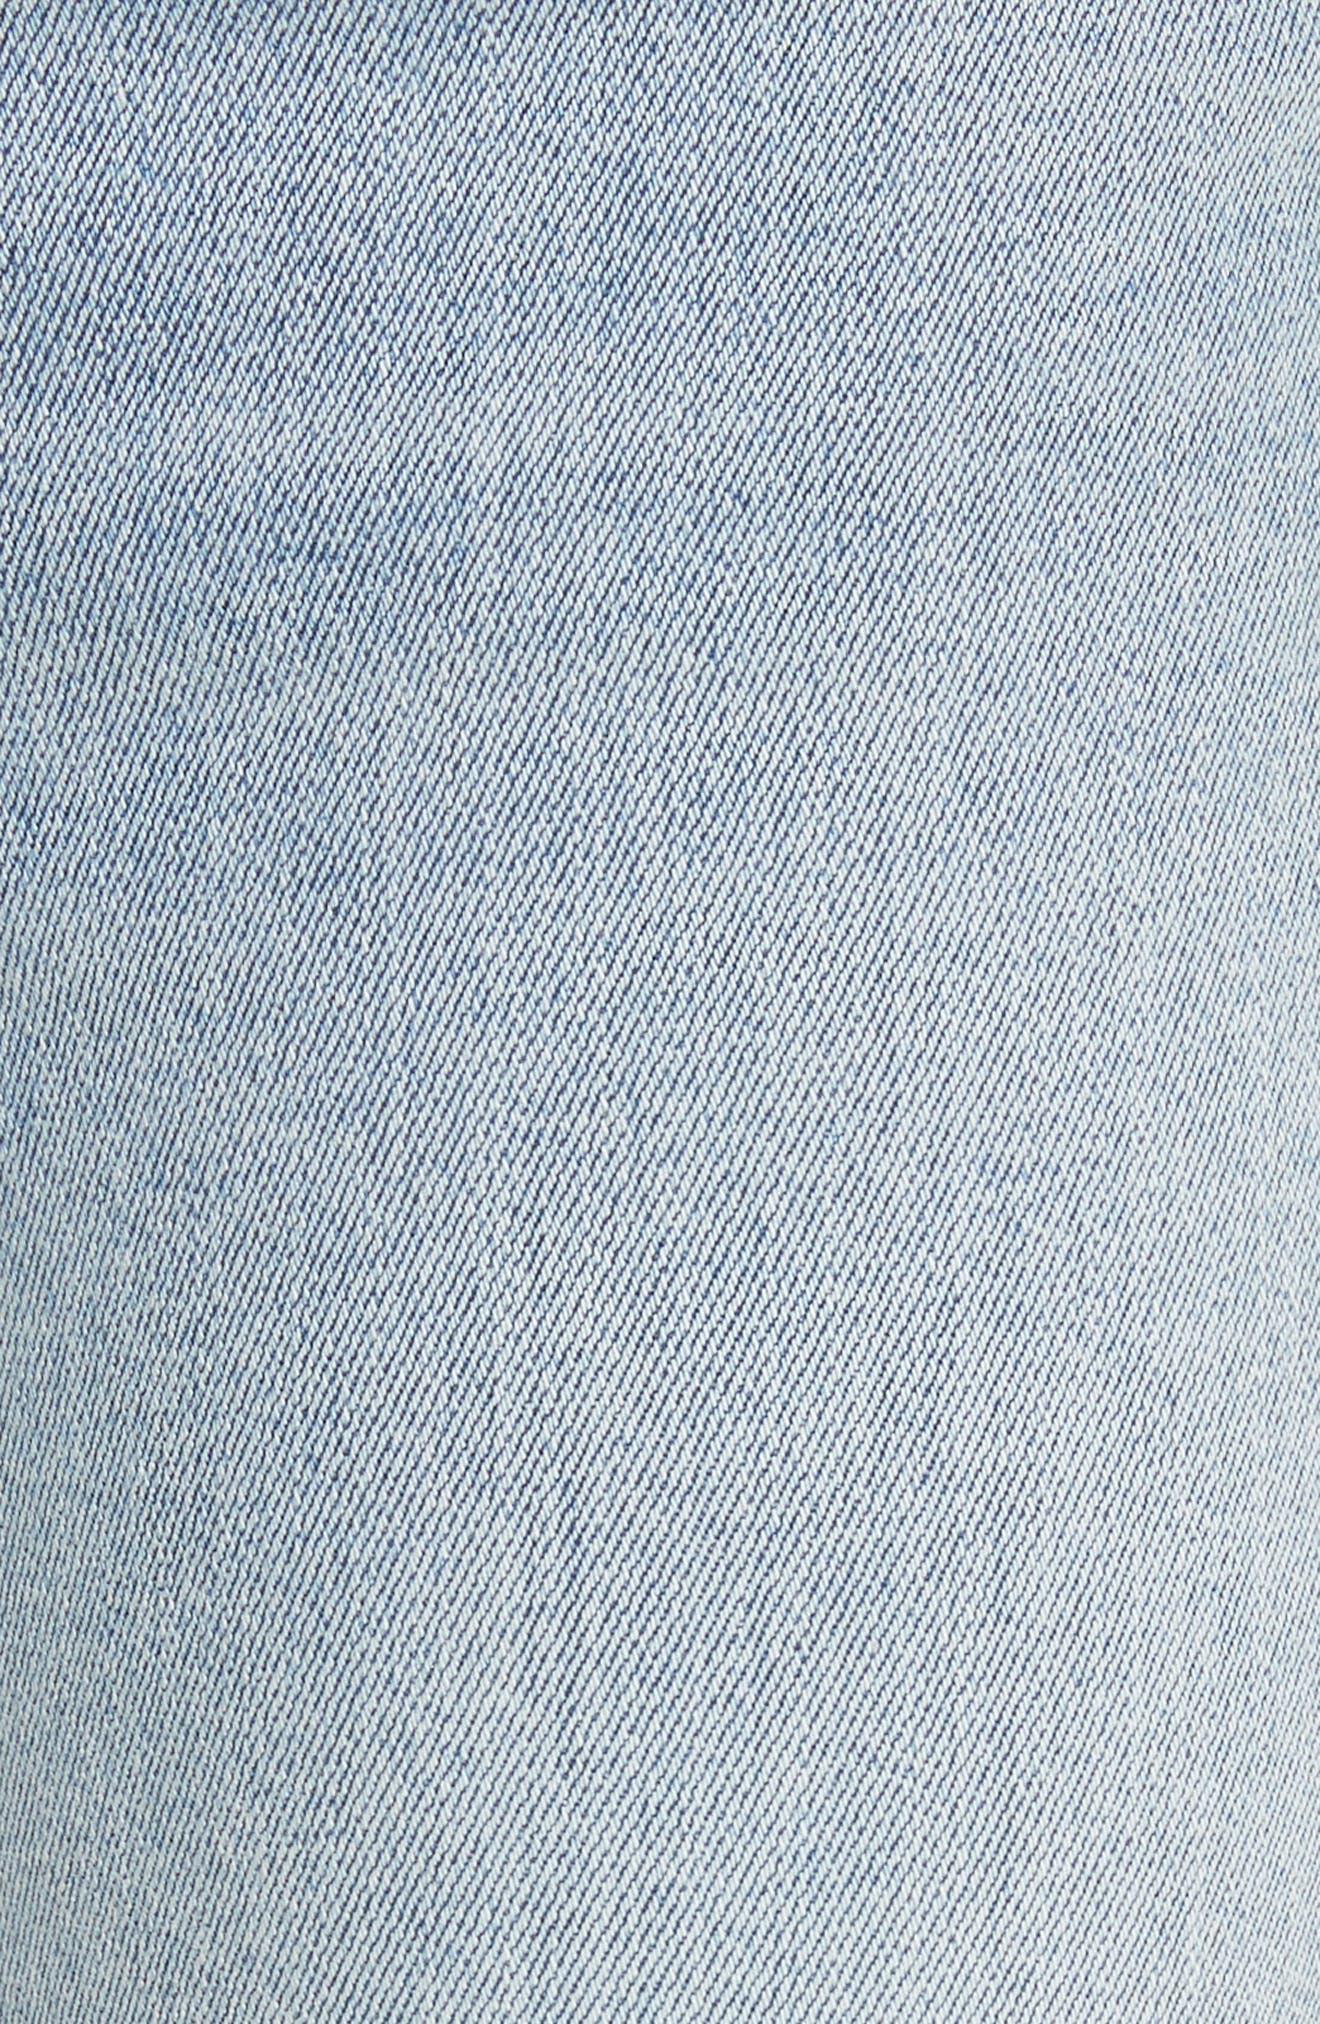 Karolina High Waist Skinny Jeans,                             Alternate thumbnail 6, color,                             TITANIUM